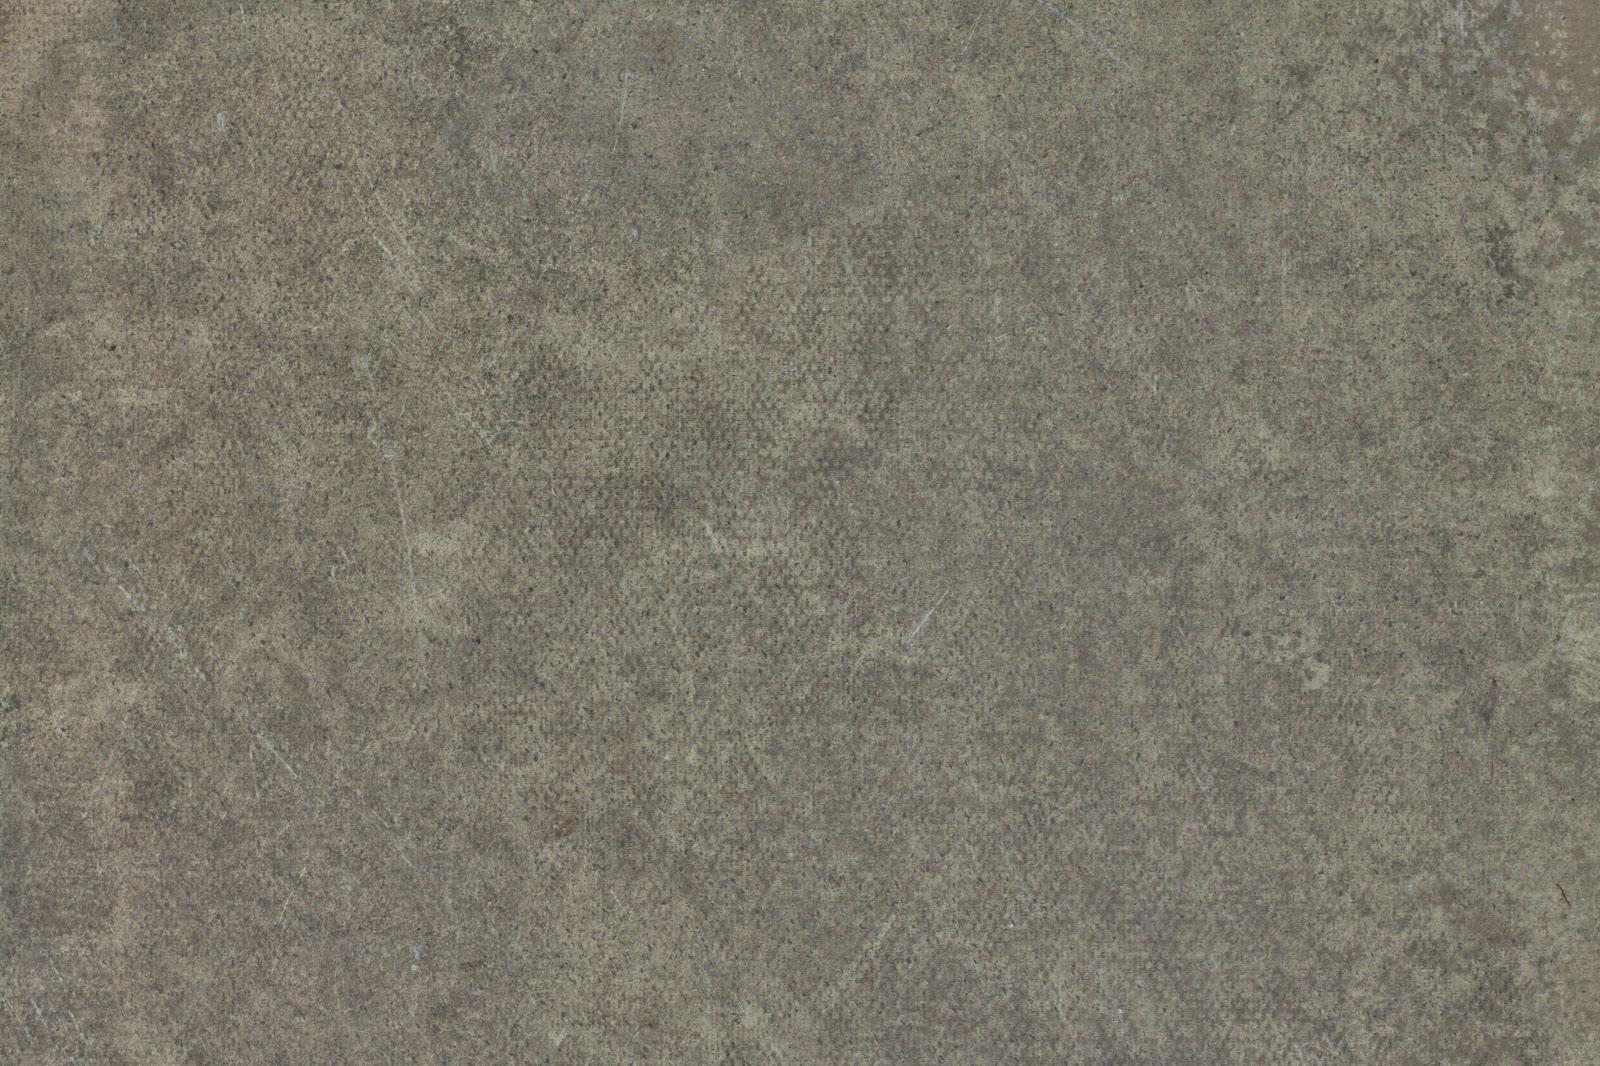 Concrete panel feb_2015 texture